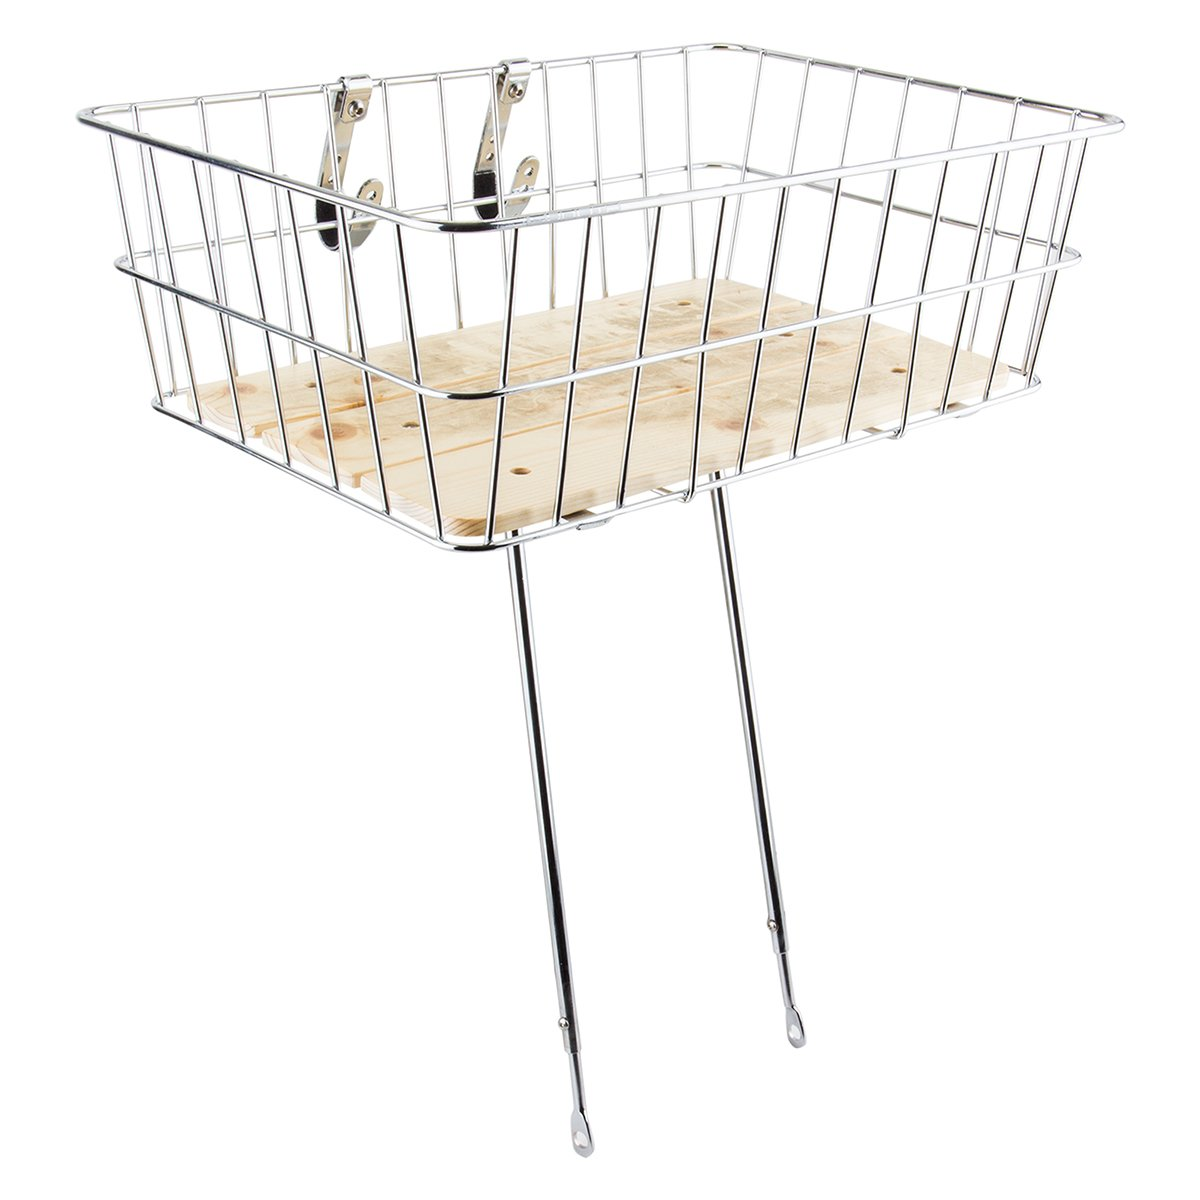 Sunlite Woody Front Basket, 18 x 13 x 6, Silver by Sunlite   B004TN28GI